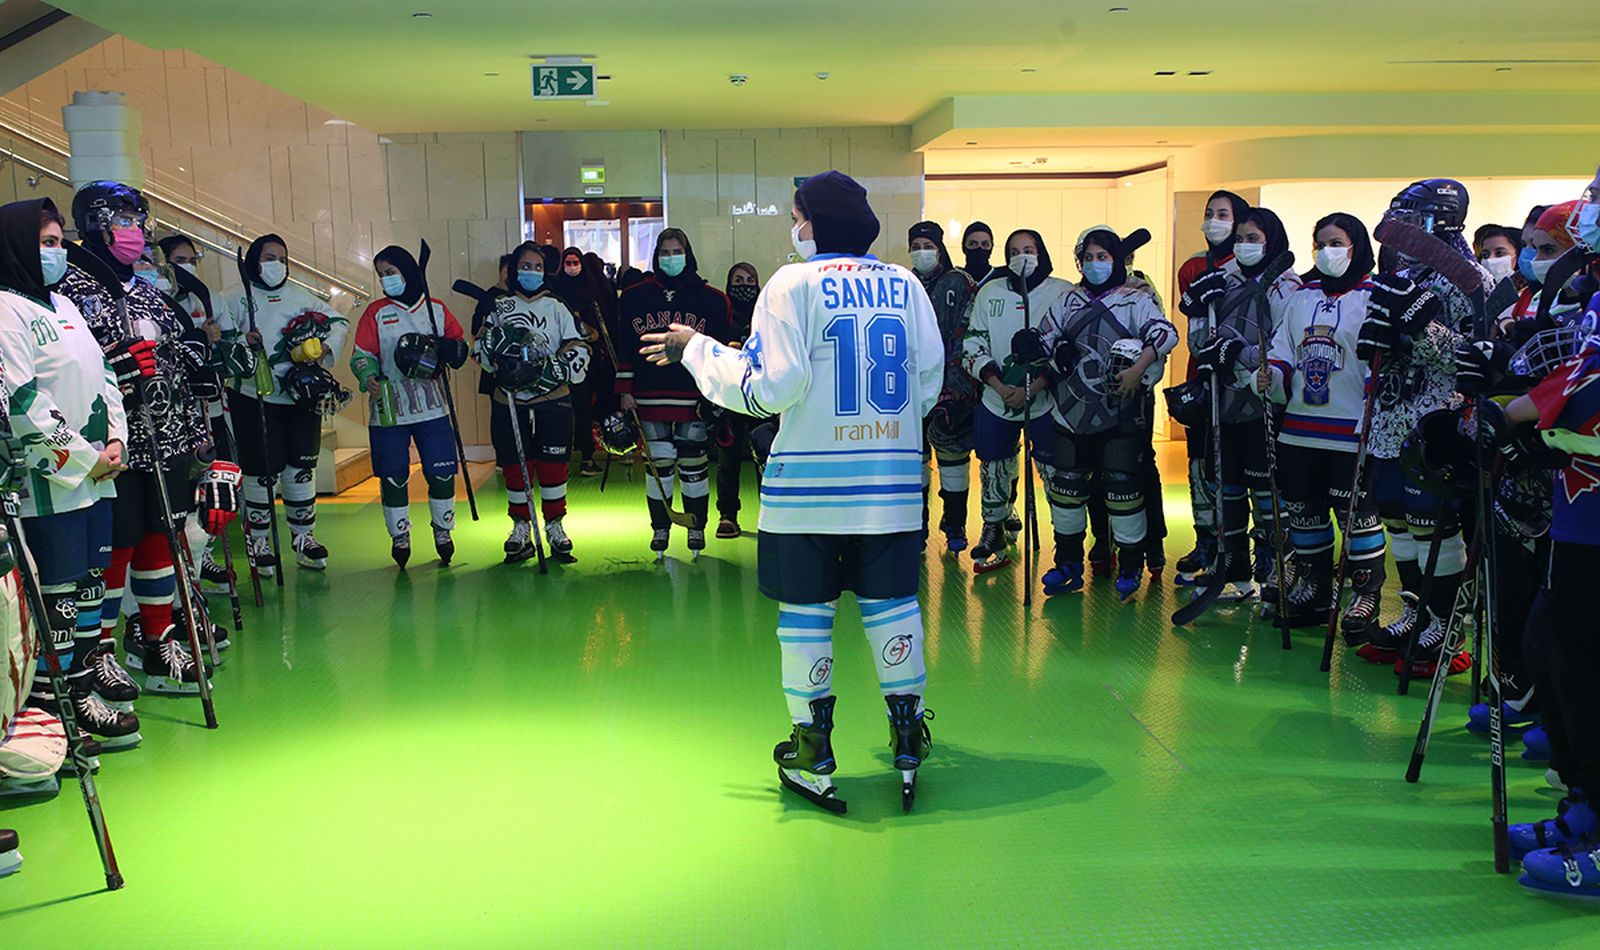 Azam Sanaei briefs hopefuls trying to make the cut for the Iranian hockey team